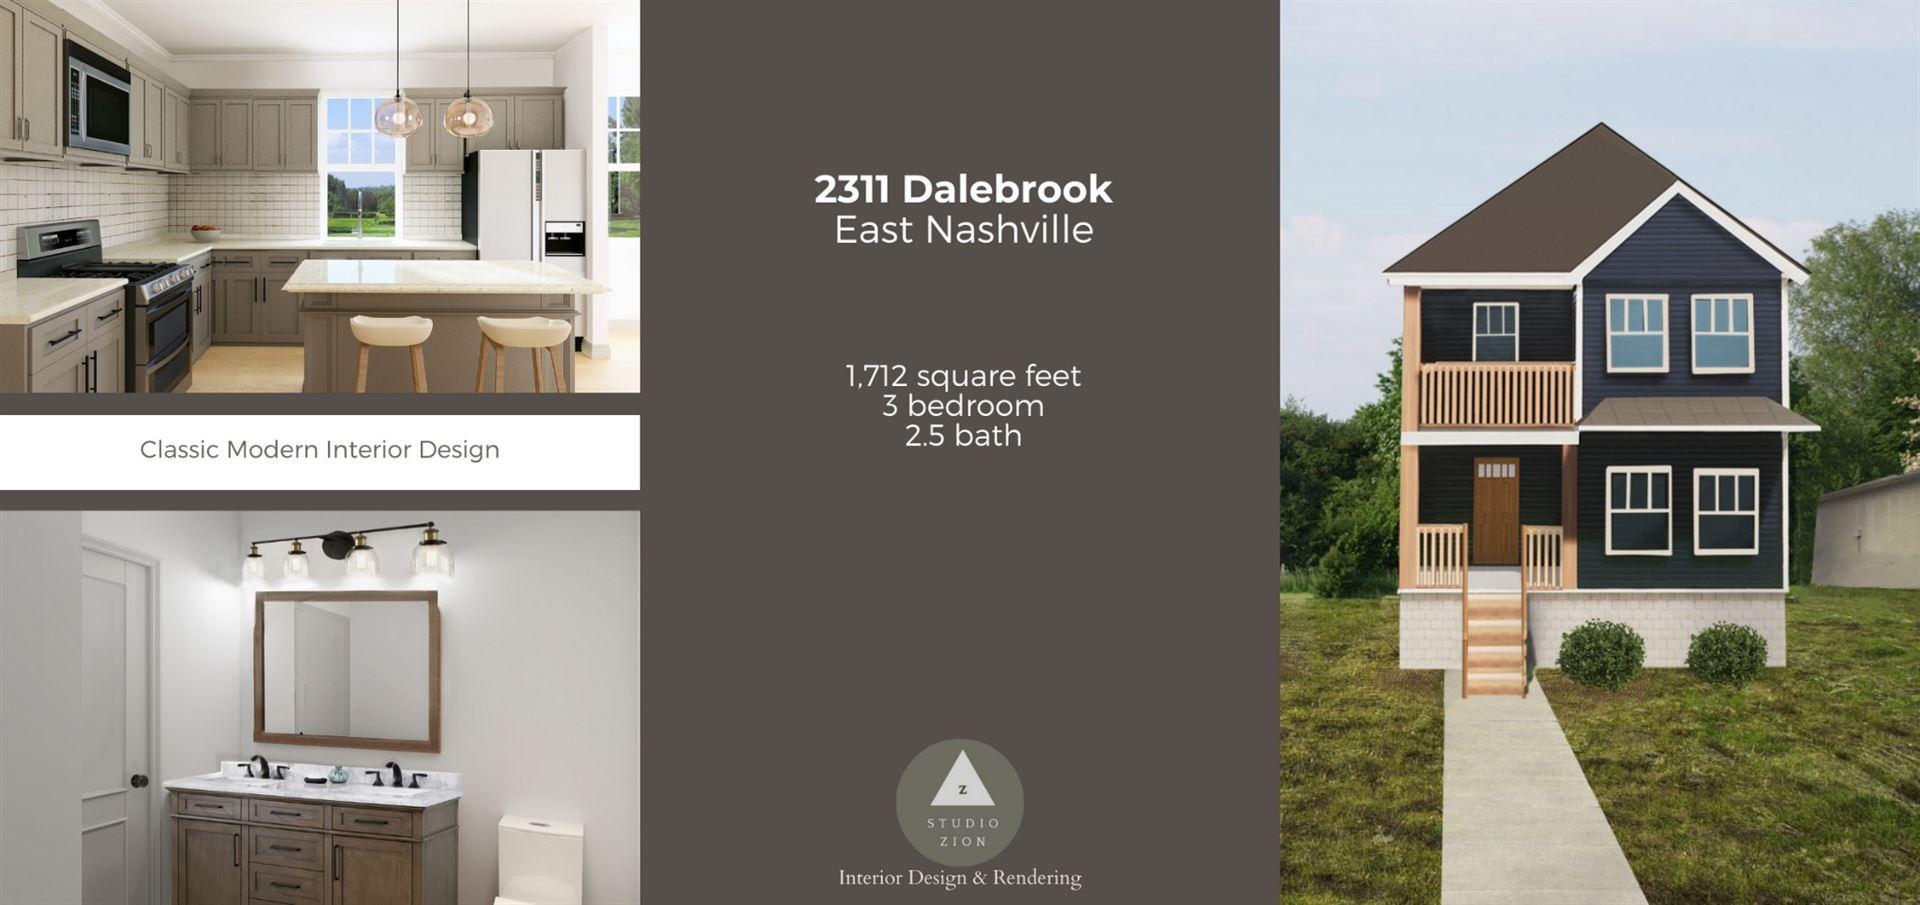 2311 Dalebrook Ct, Nashville, TN 37206 - MLS#: 2266109